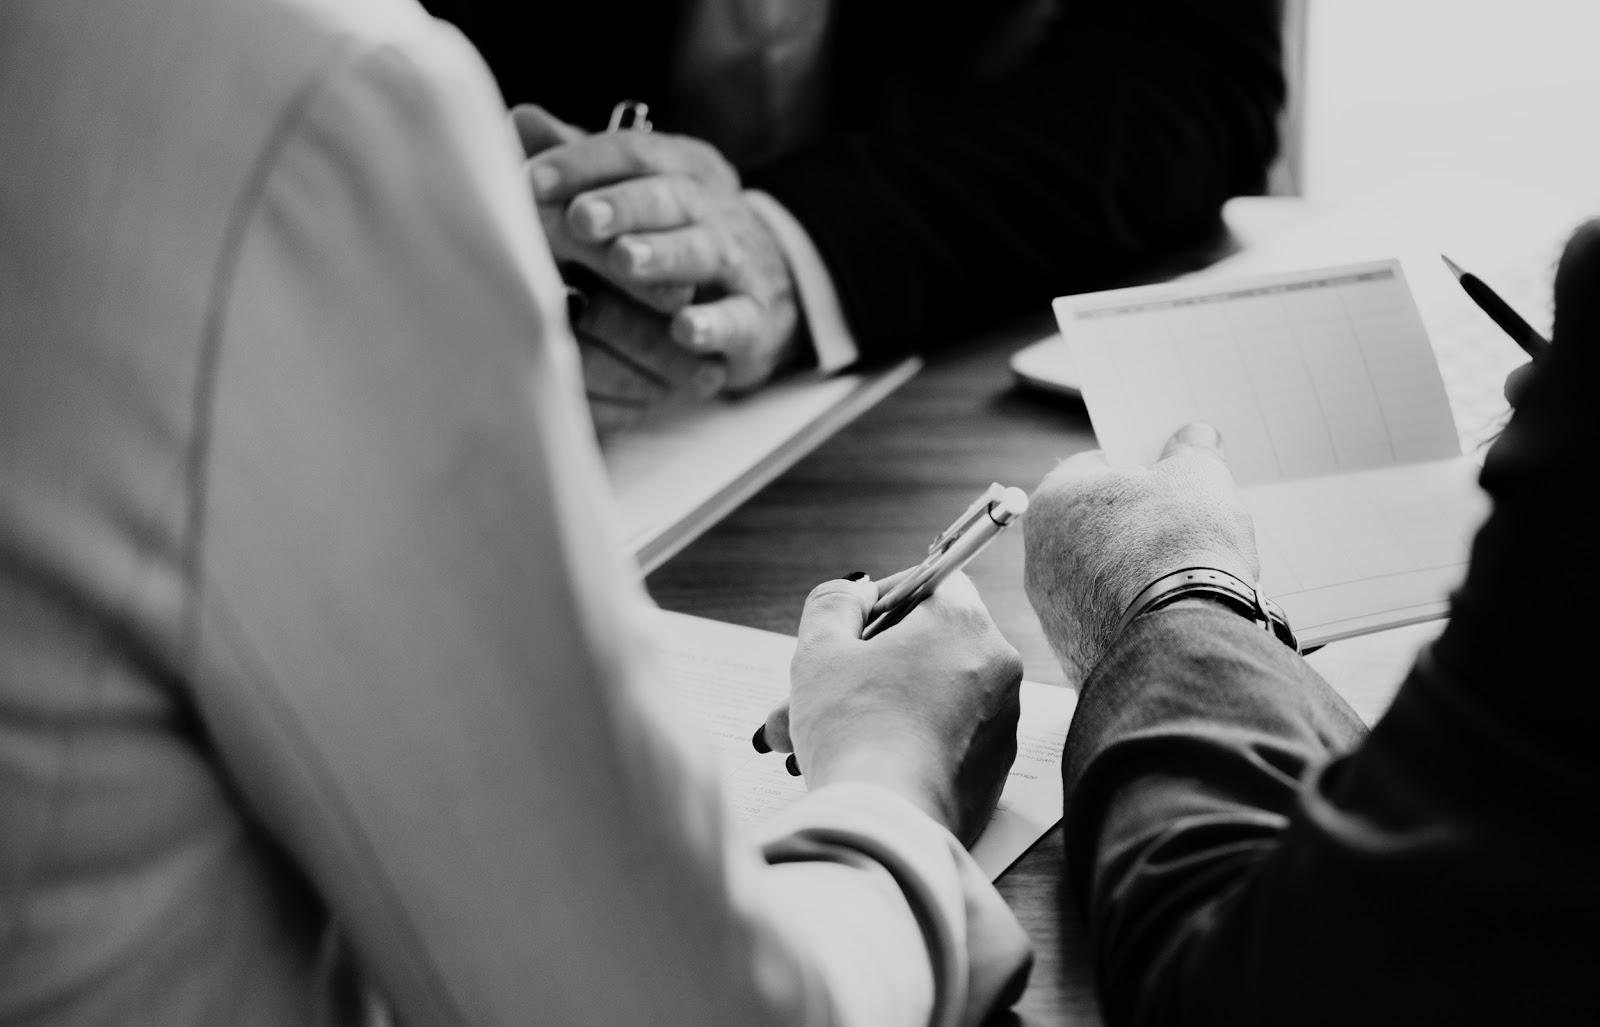 When Should You Provide Financial Compliance Training?